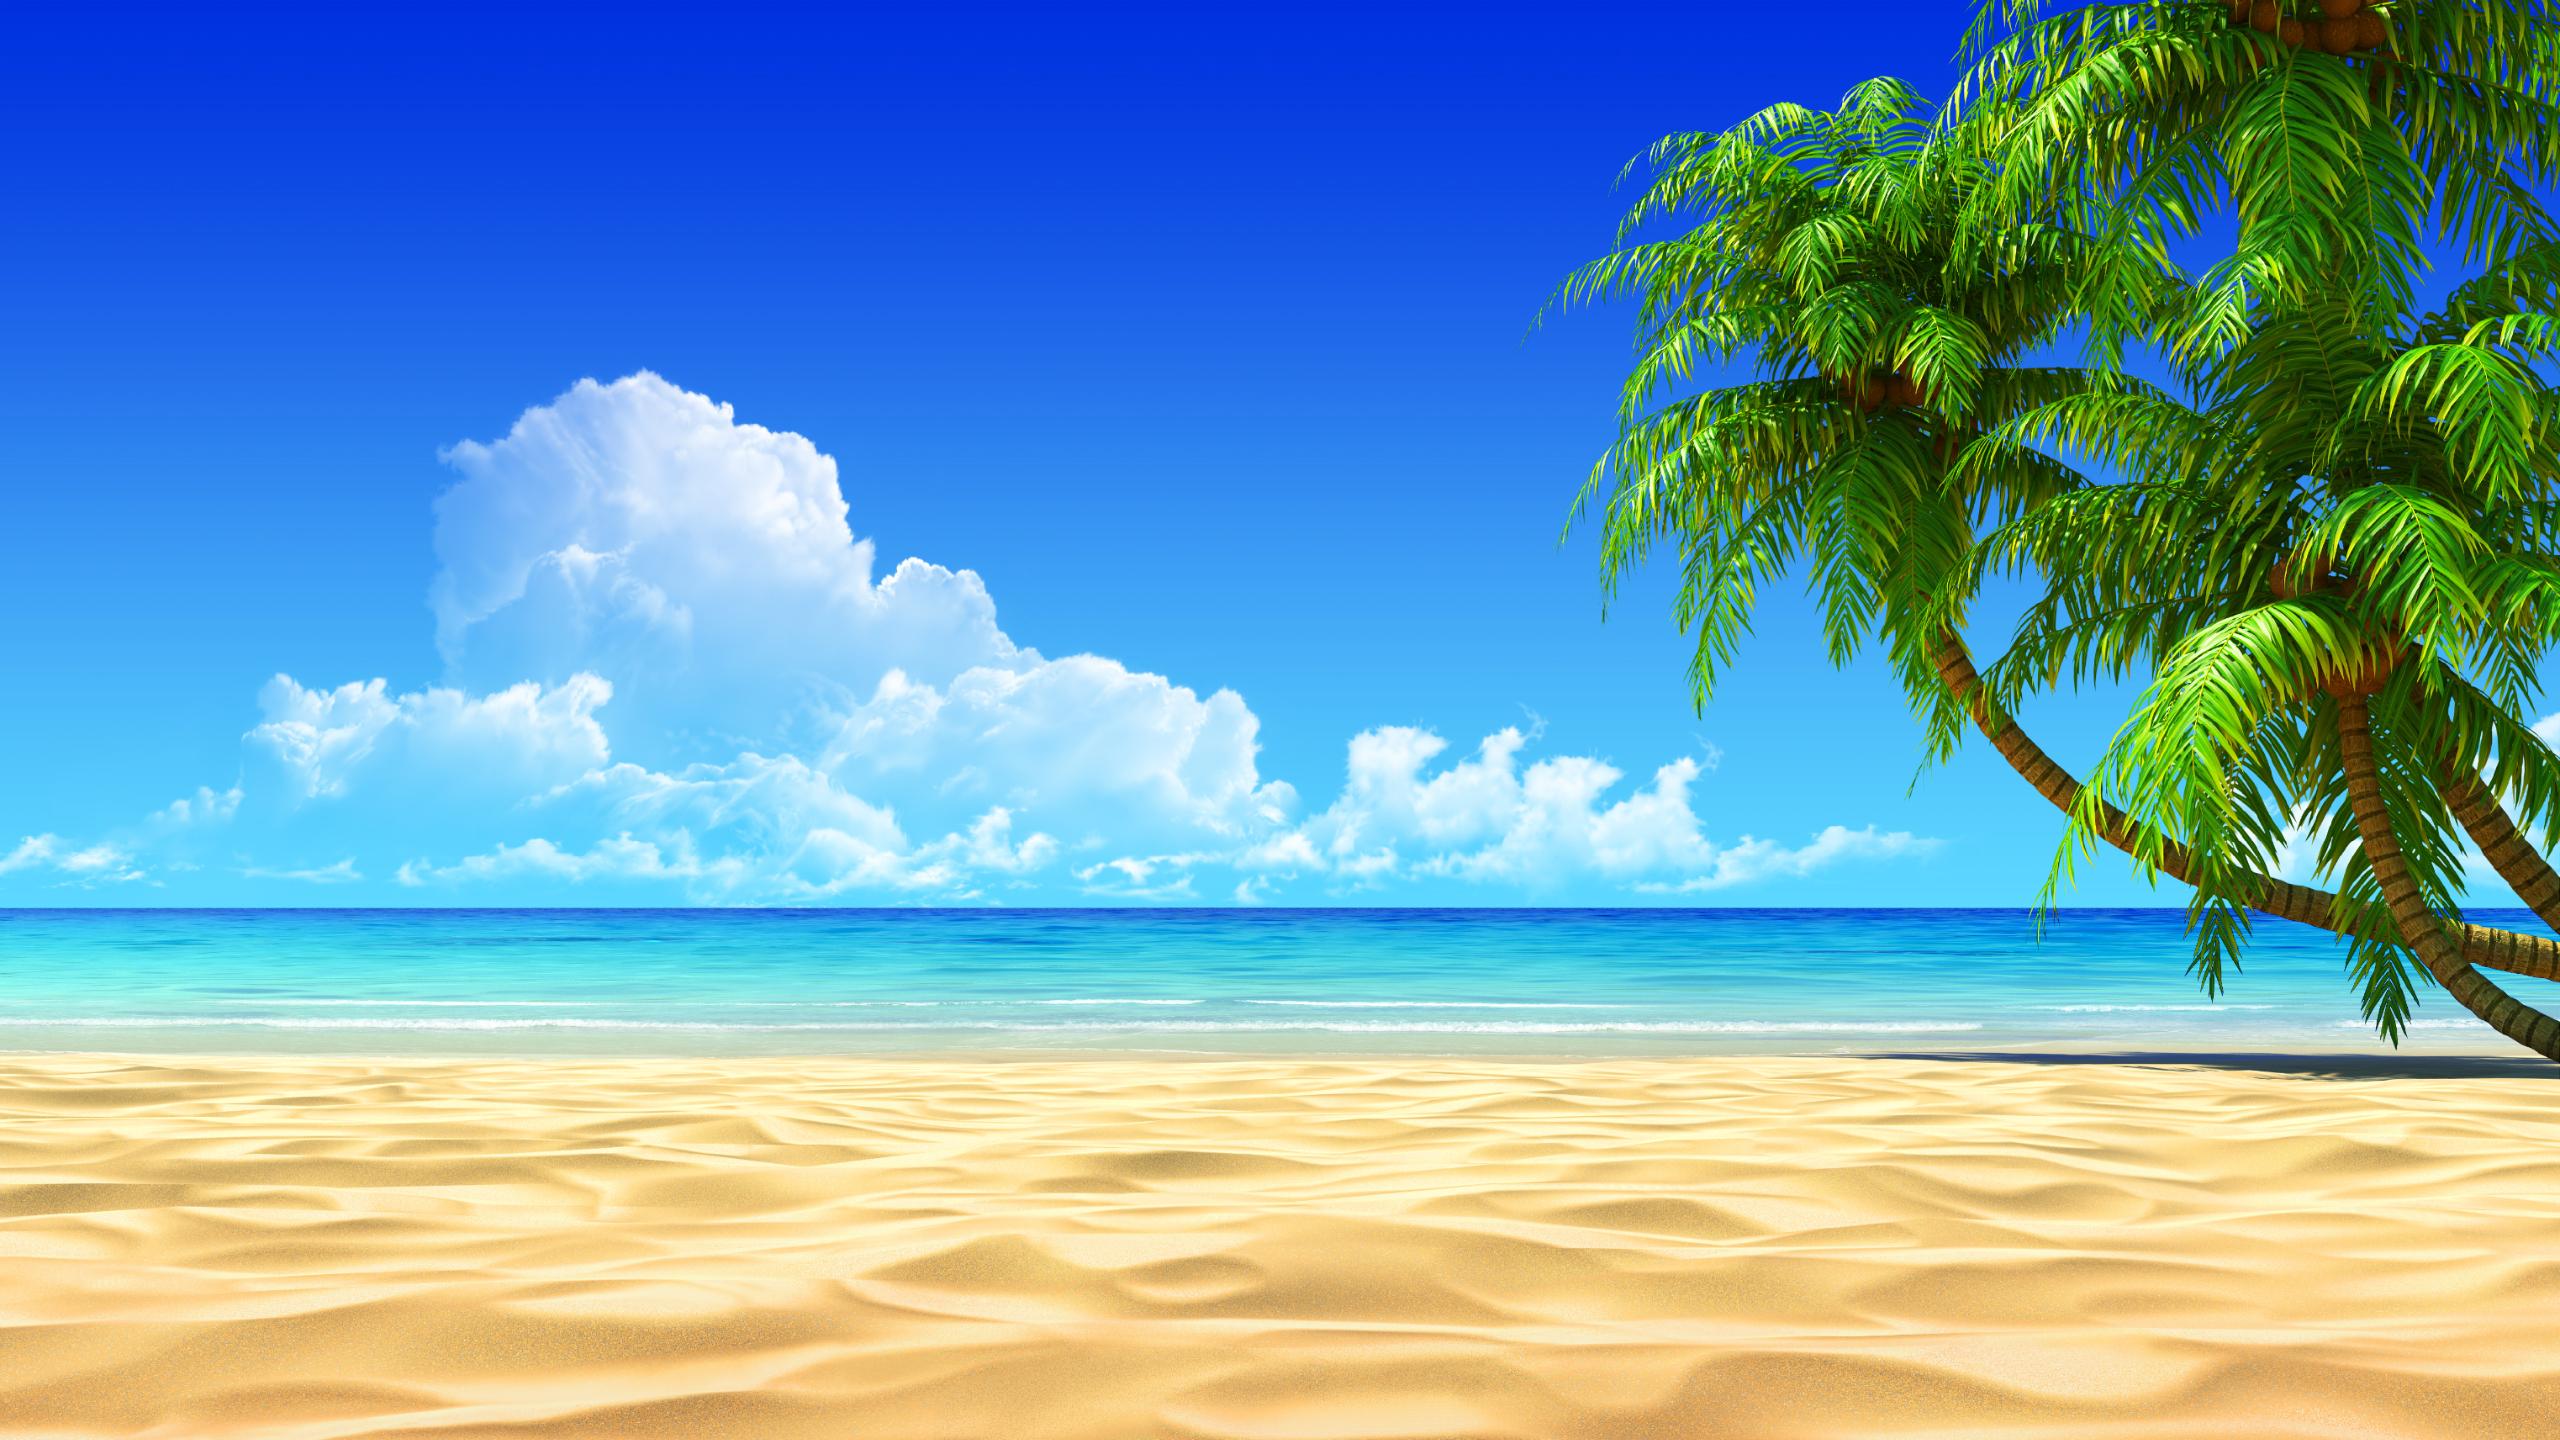 Wallpaper tropics beach ocean exotic wallpapers nature   download 2560x1440